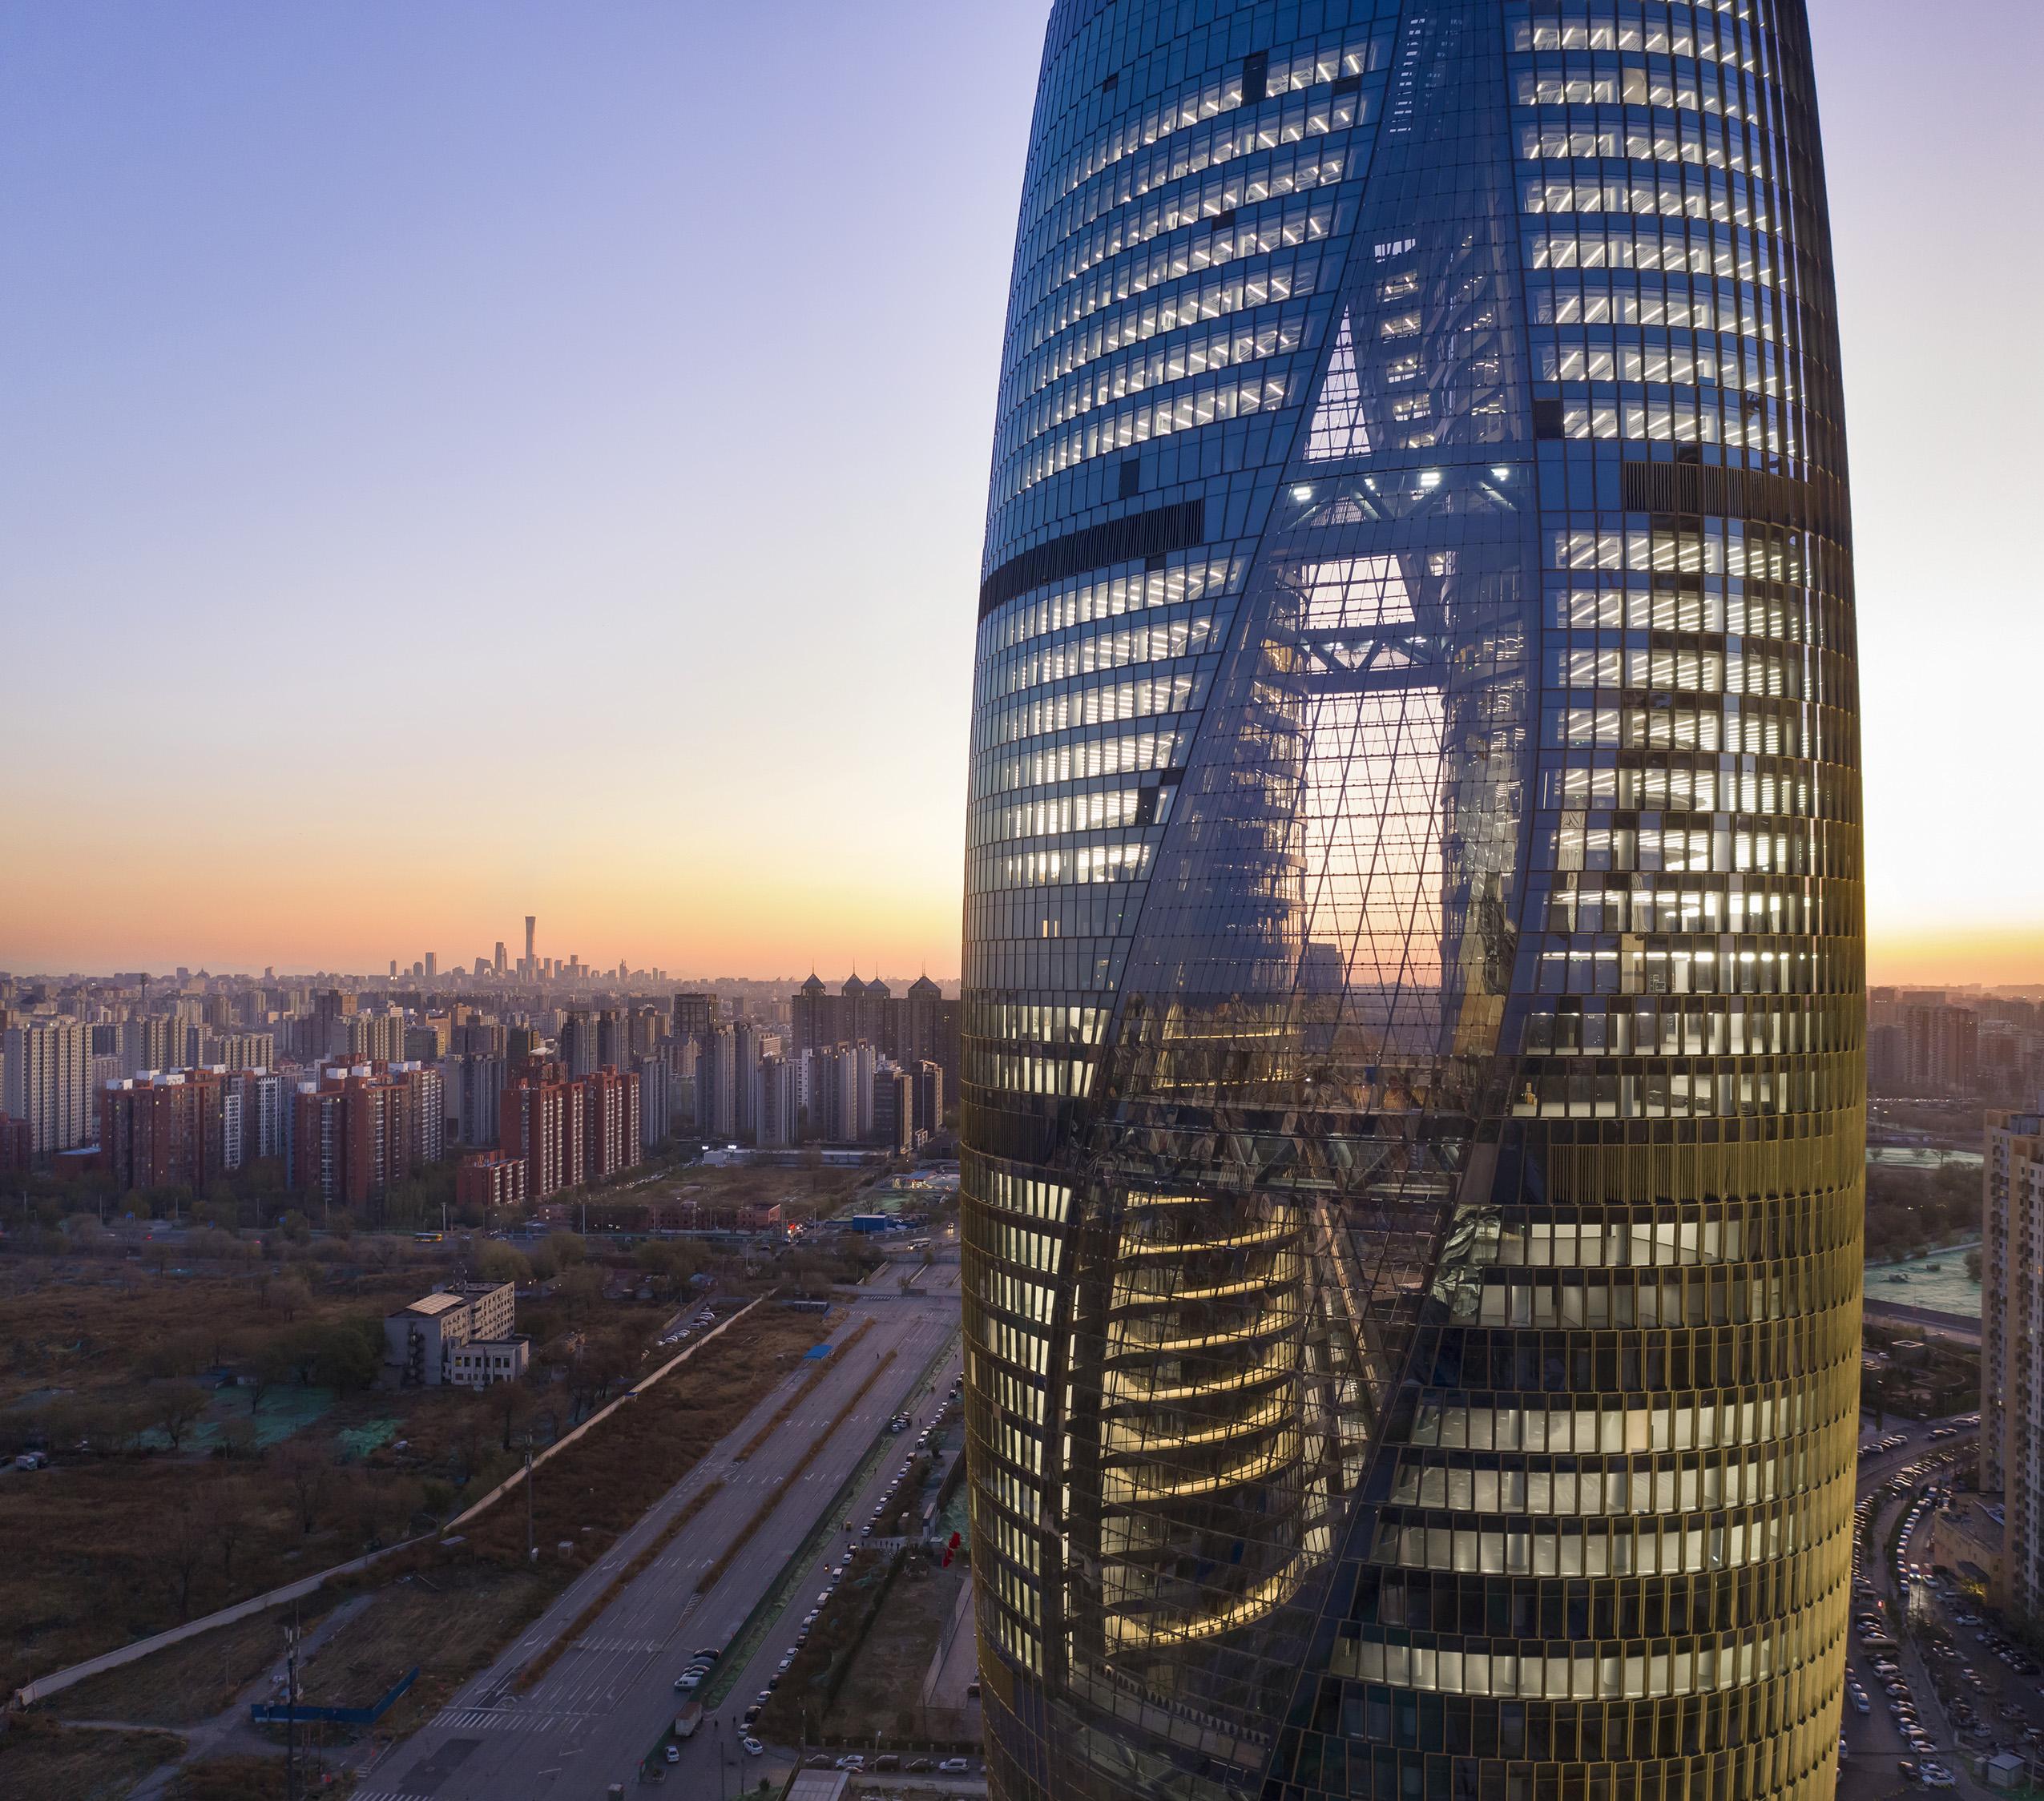 Zaha Hadid Architects' new tower shows off world's tallest atrium